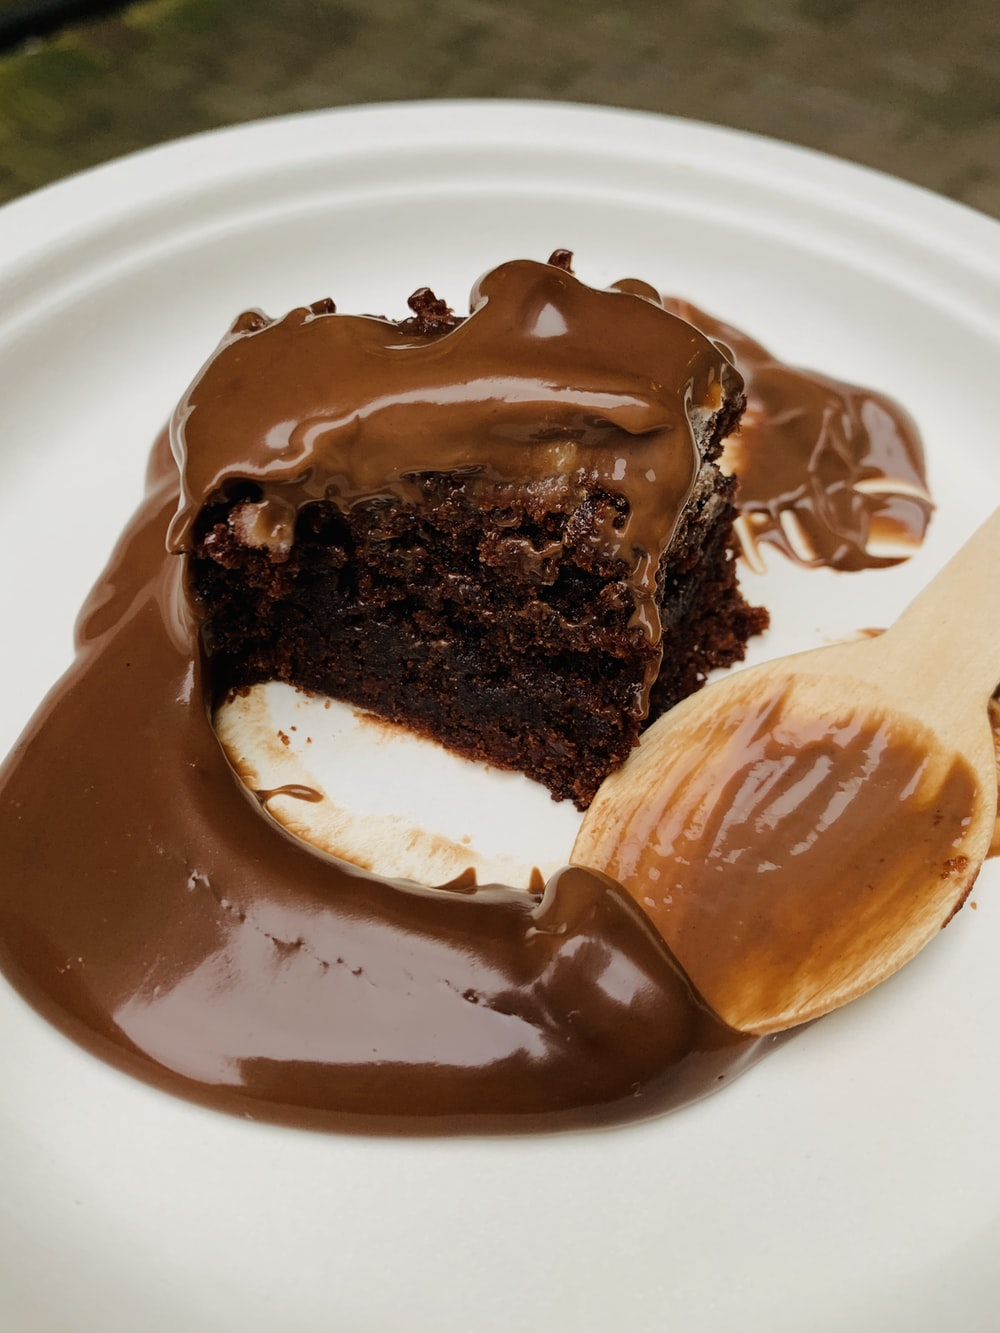 moist chocolate cake on round white plate